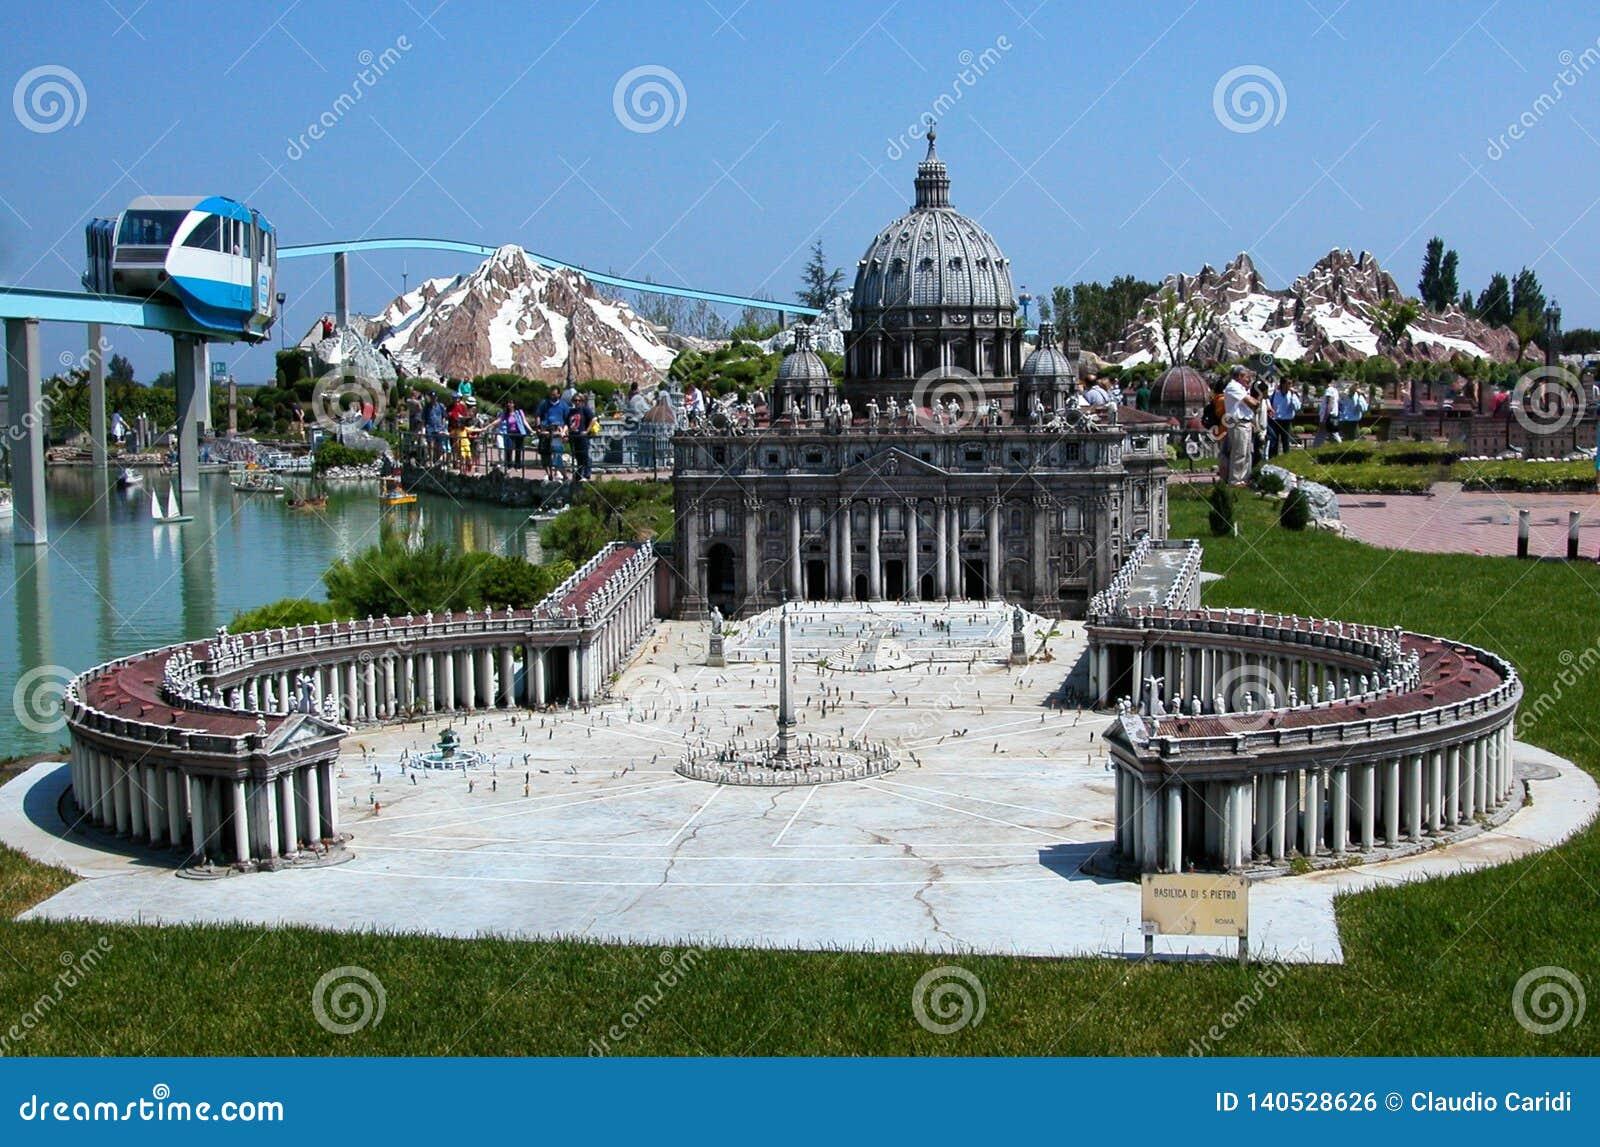 Sts Peter basilika Rome i nöjesfältet 'Italien i miniatyren 'Italia i miniaturaen Viserba, Rimini, Italien